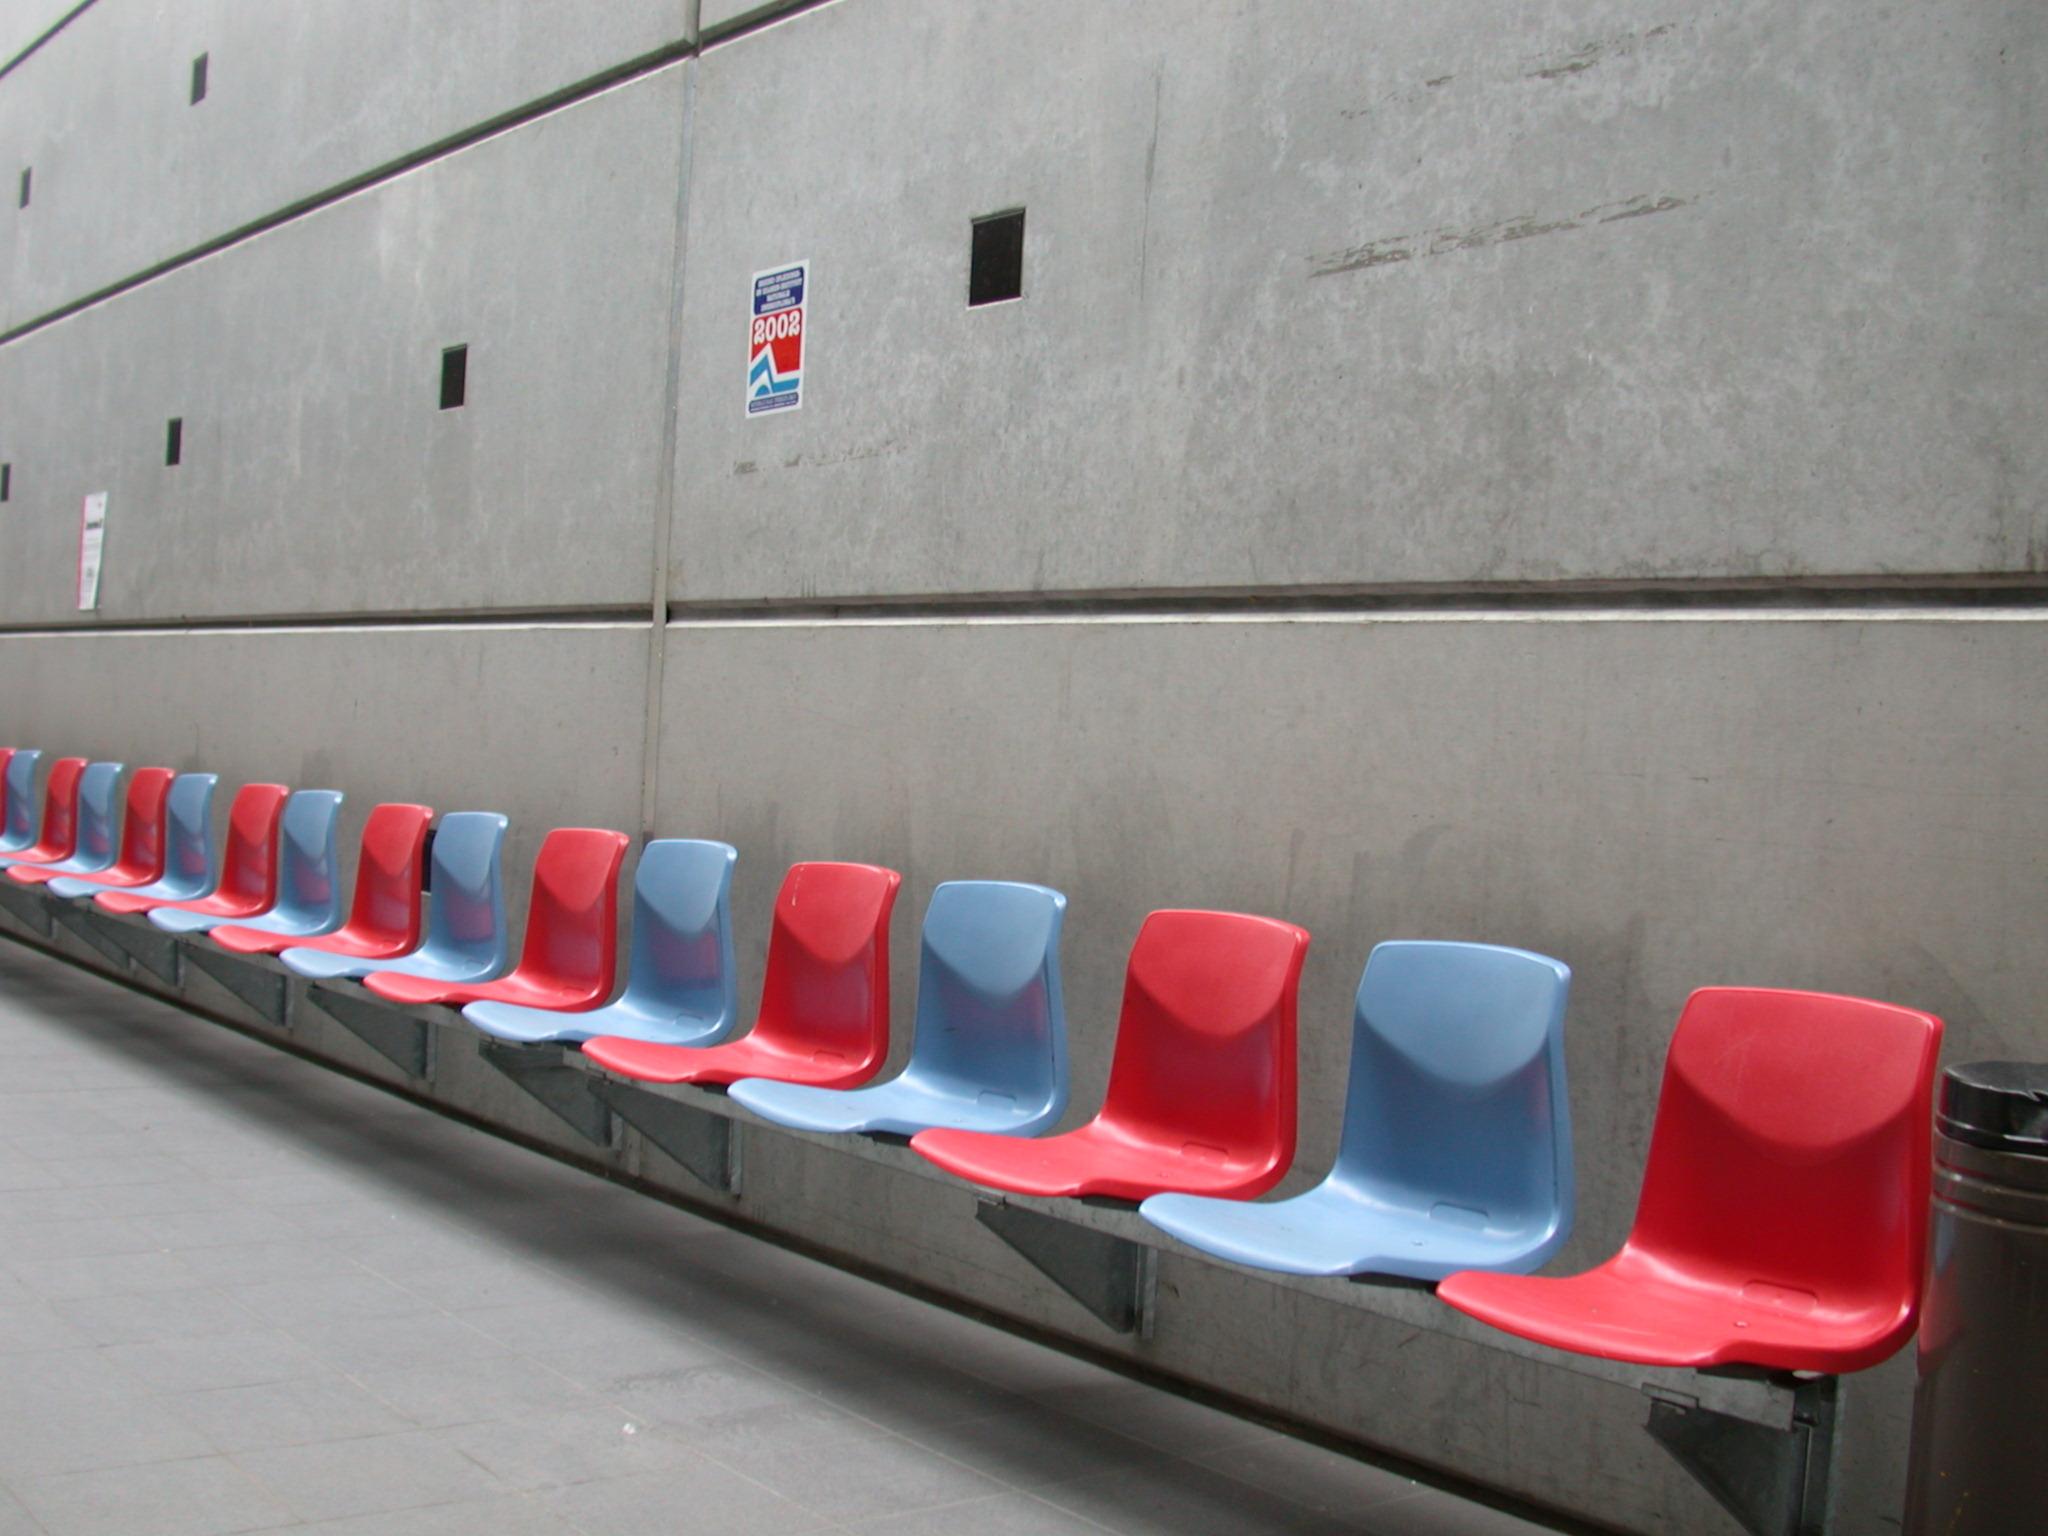 chairs red blue chari concrete wall waiting room waitingroom